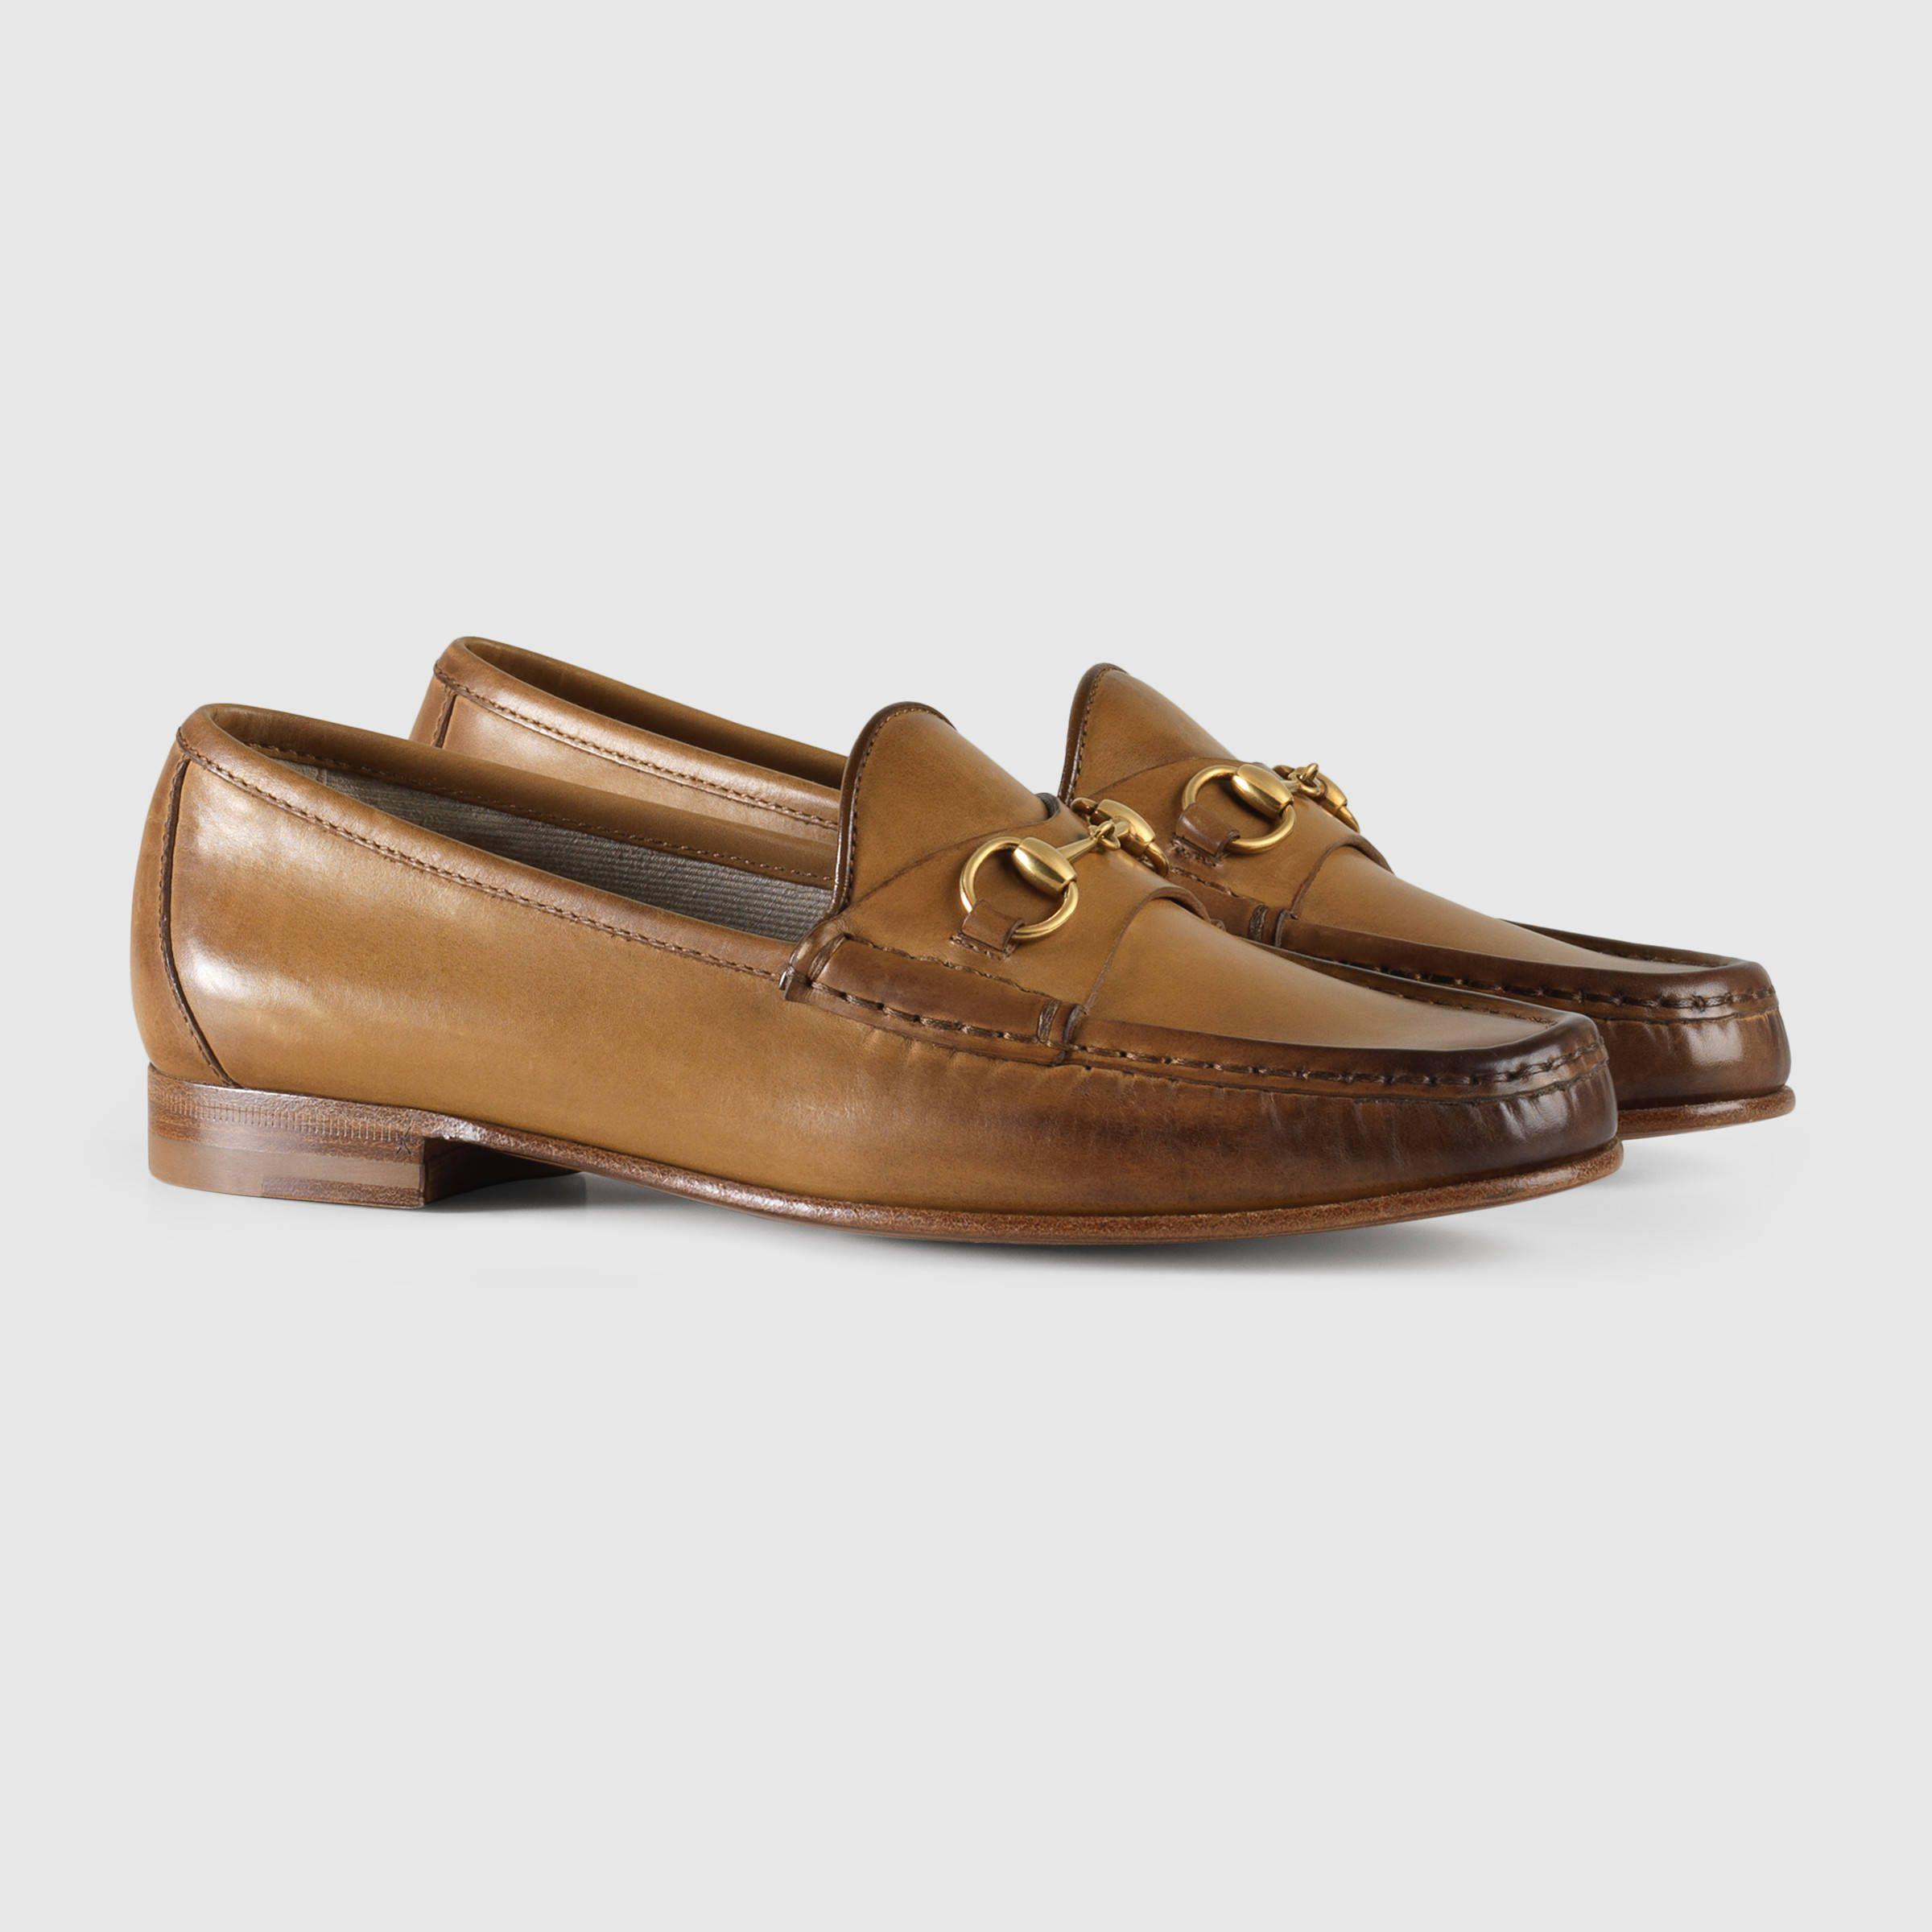 2b71d7fd3b7 Gucci Women - 1953 horsebit loafer in leather - 309701BLM002527 ...